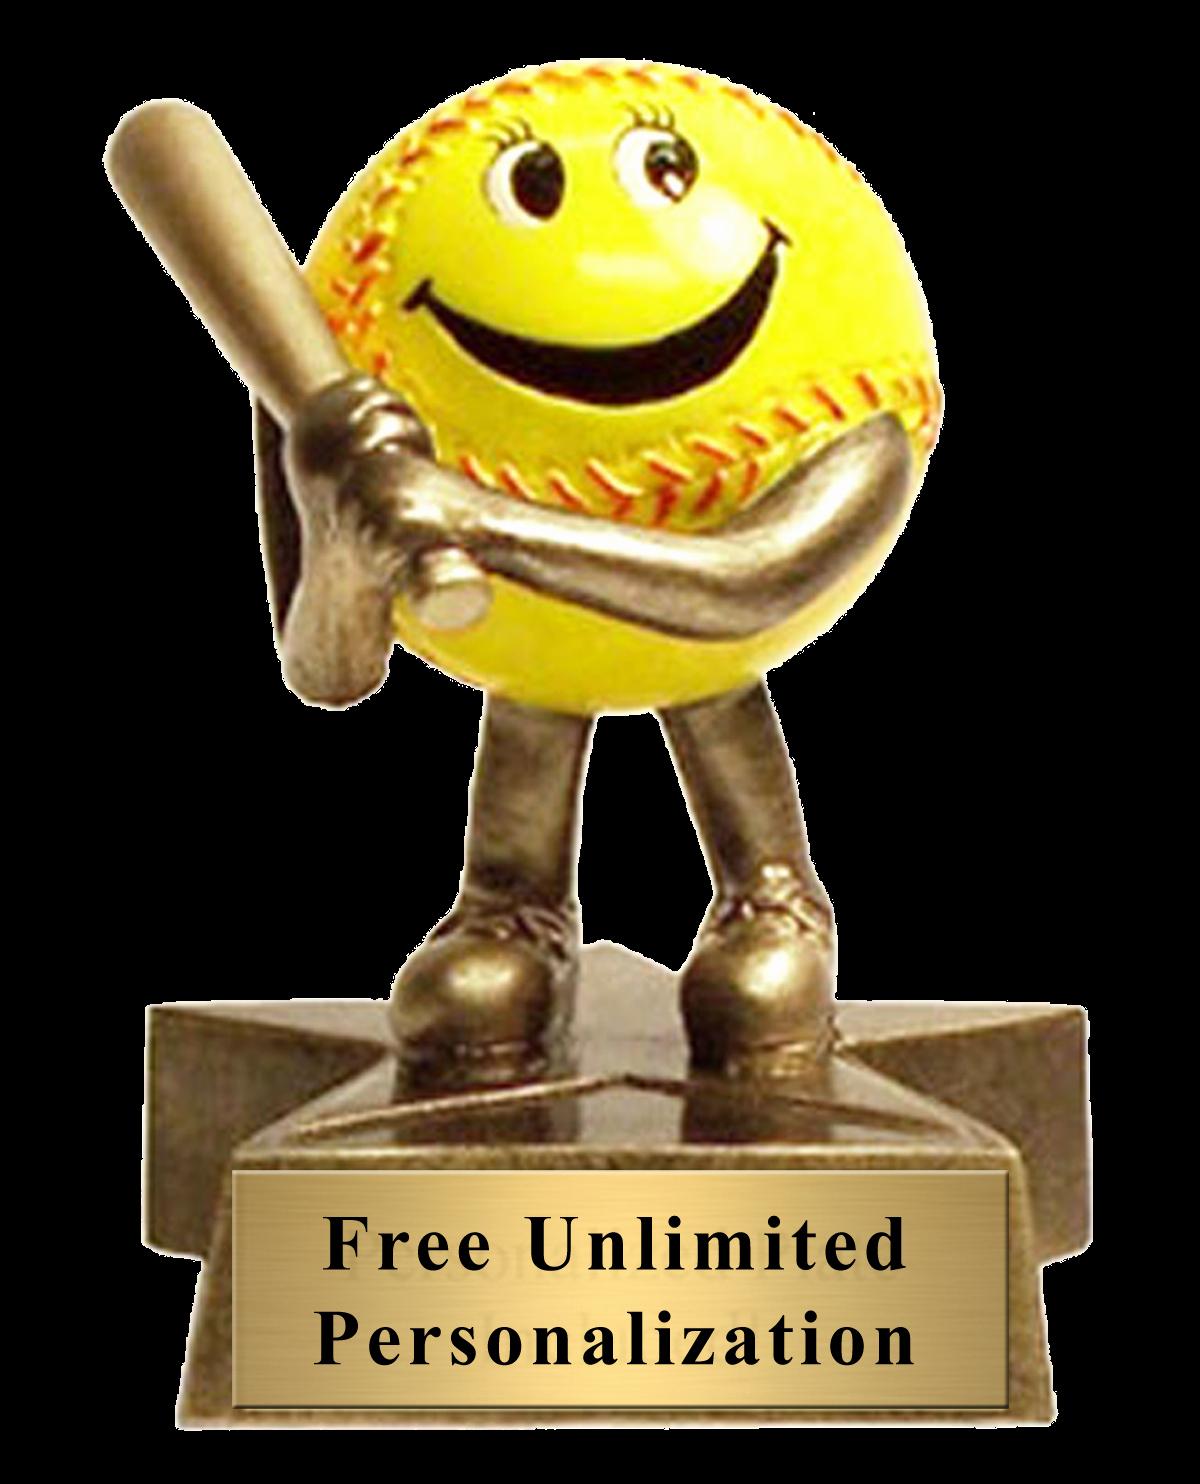 Silly Awards for Kids Inspirational 9 Fun softball Award Ideas for Kids